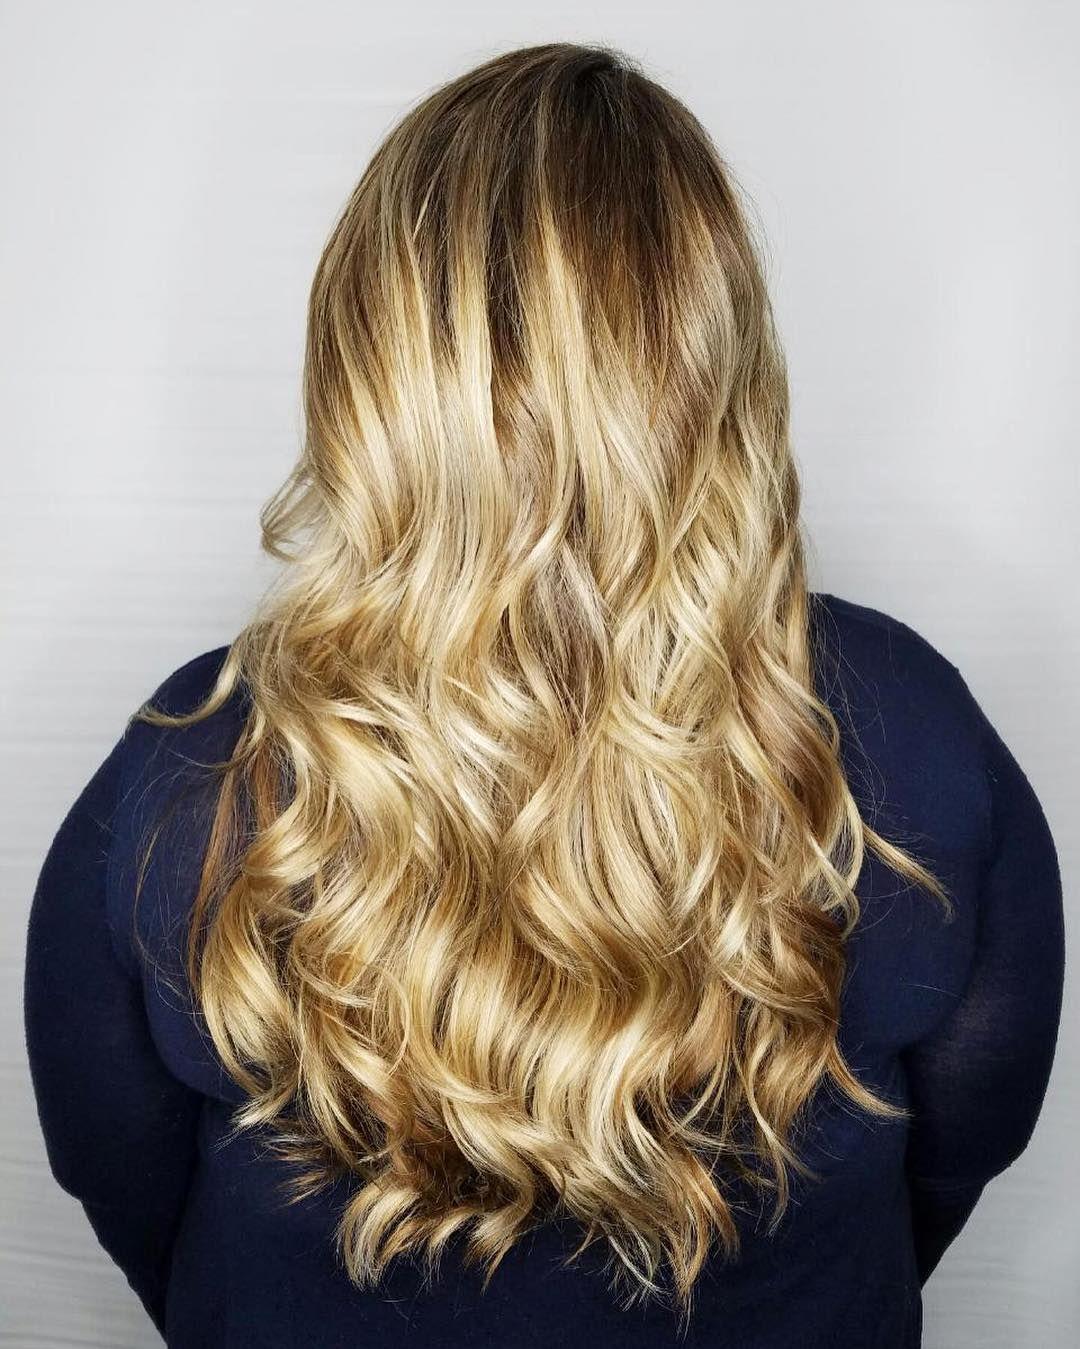 Sunny Blonde Hair By Apri Does Hair Hair Hair Salon Long Hair Styles